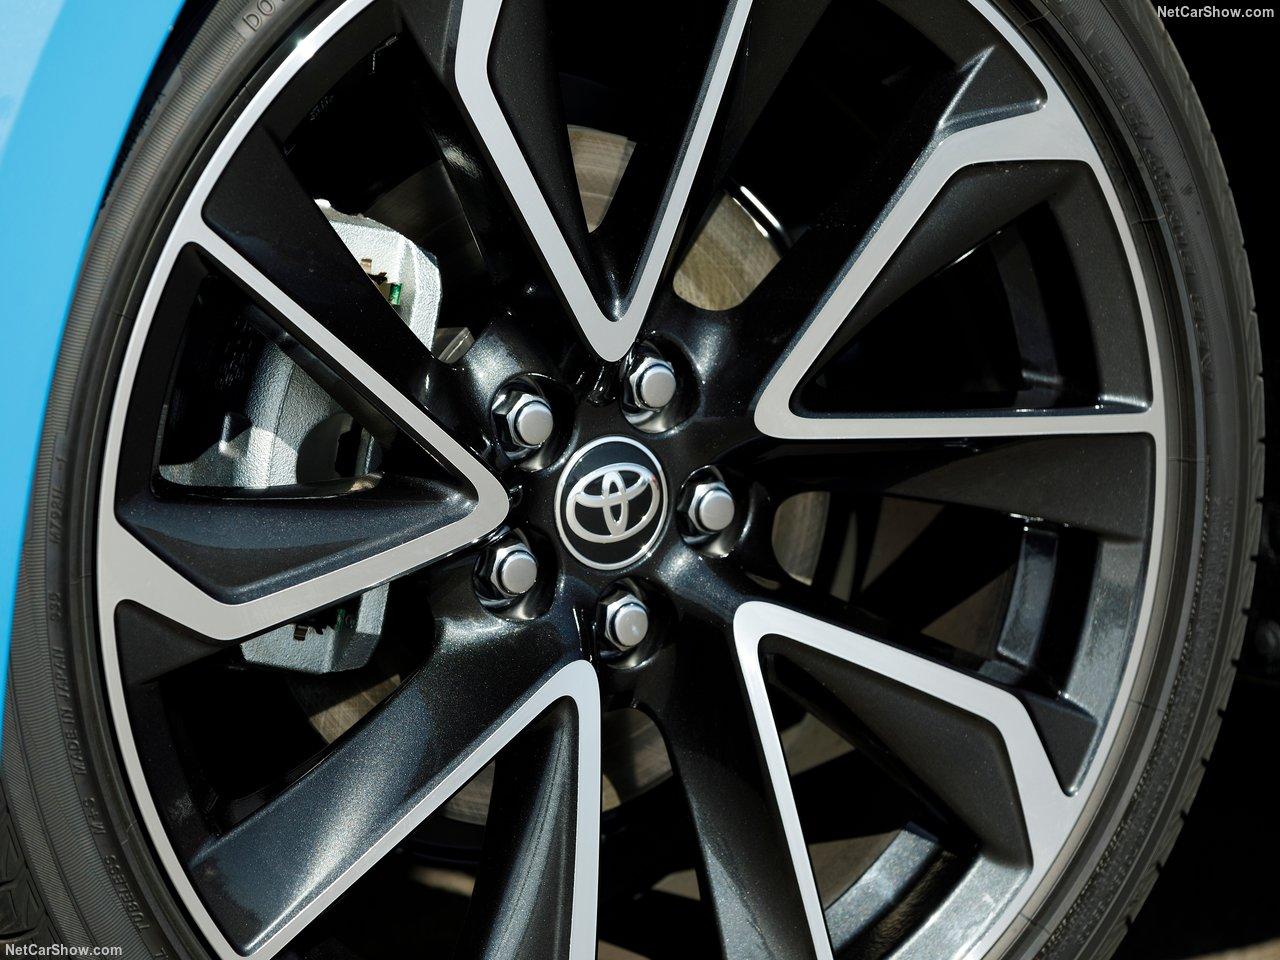 Toyota-Corolla_Hatchback-2019-1280-6e.jpg